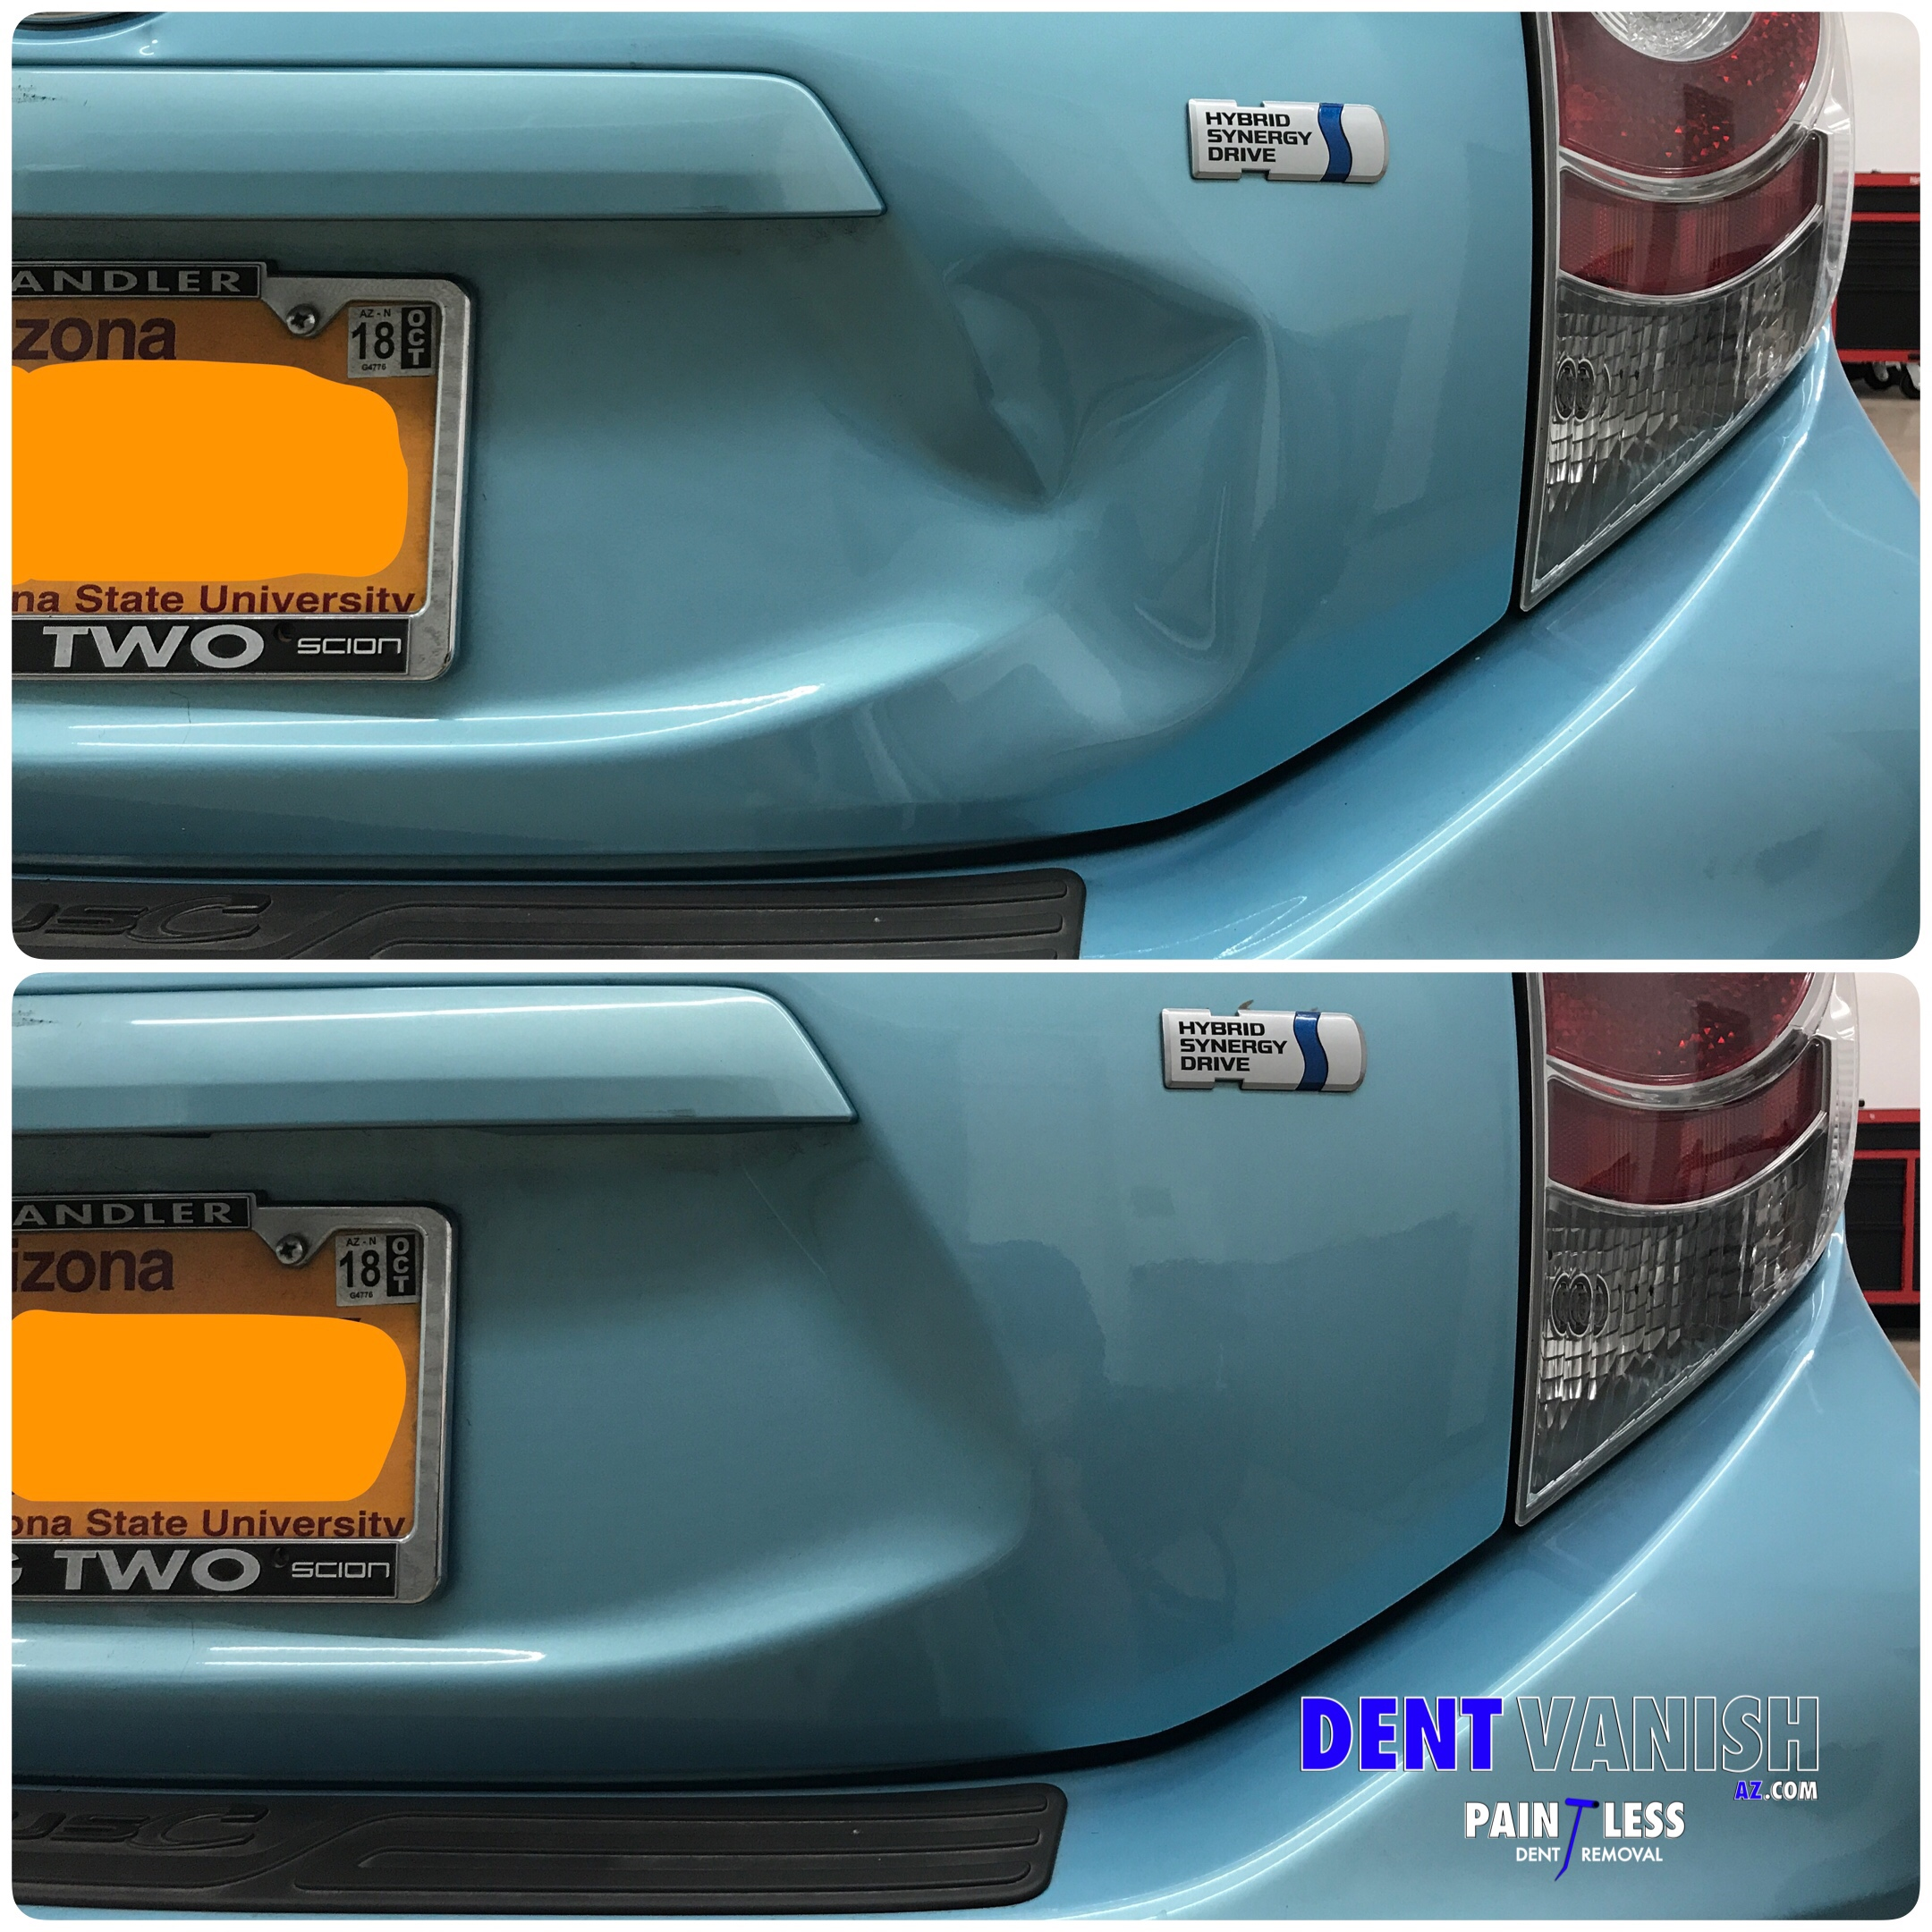 Dent Vanish AZ | Paintless Dent Repair | Mobile Service